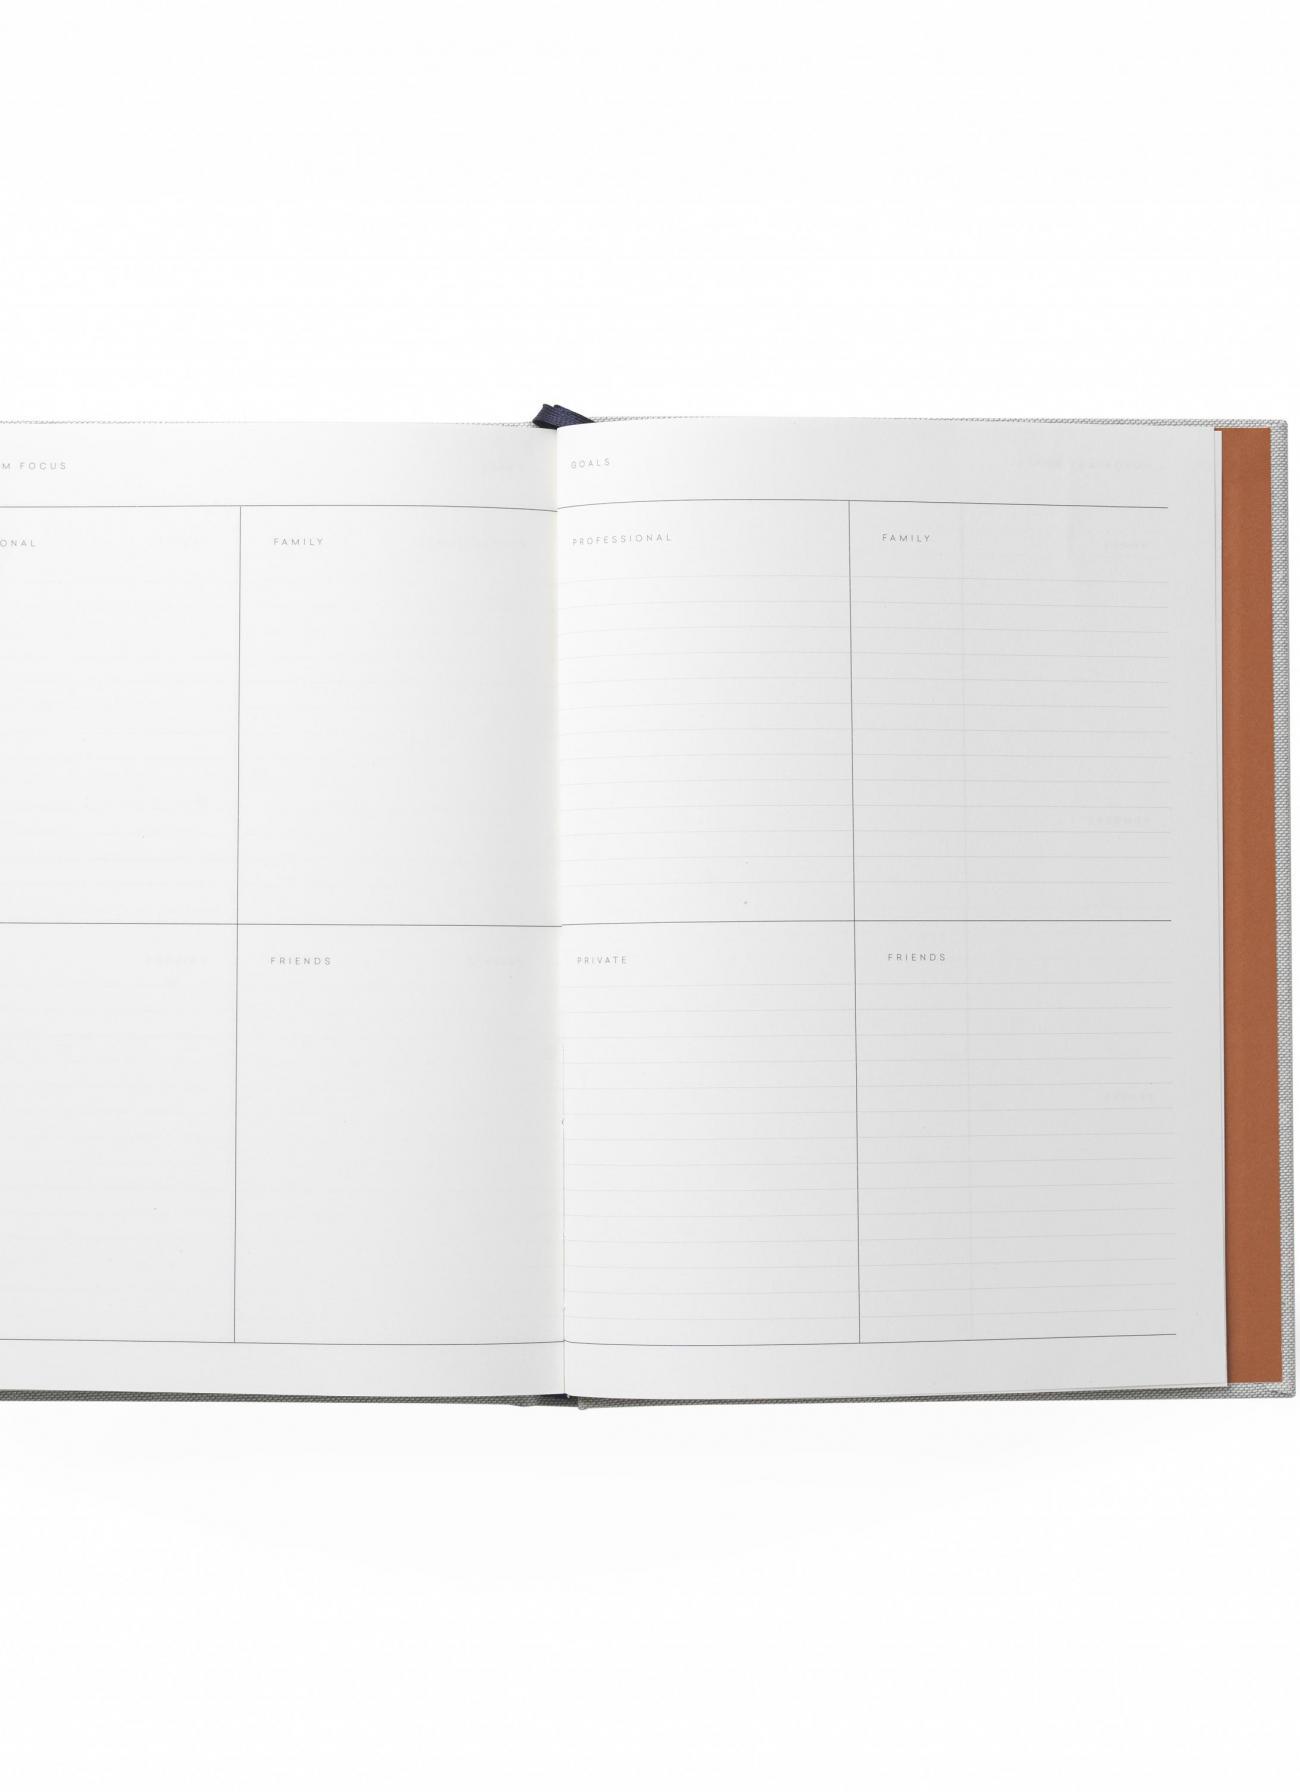 Notem - Even Work Journal - Grey Cloth